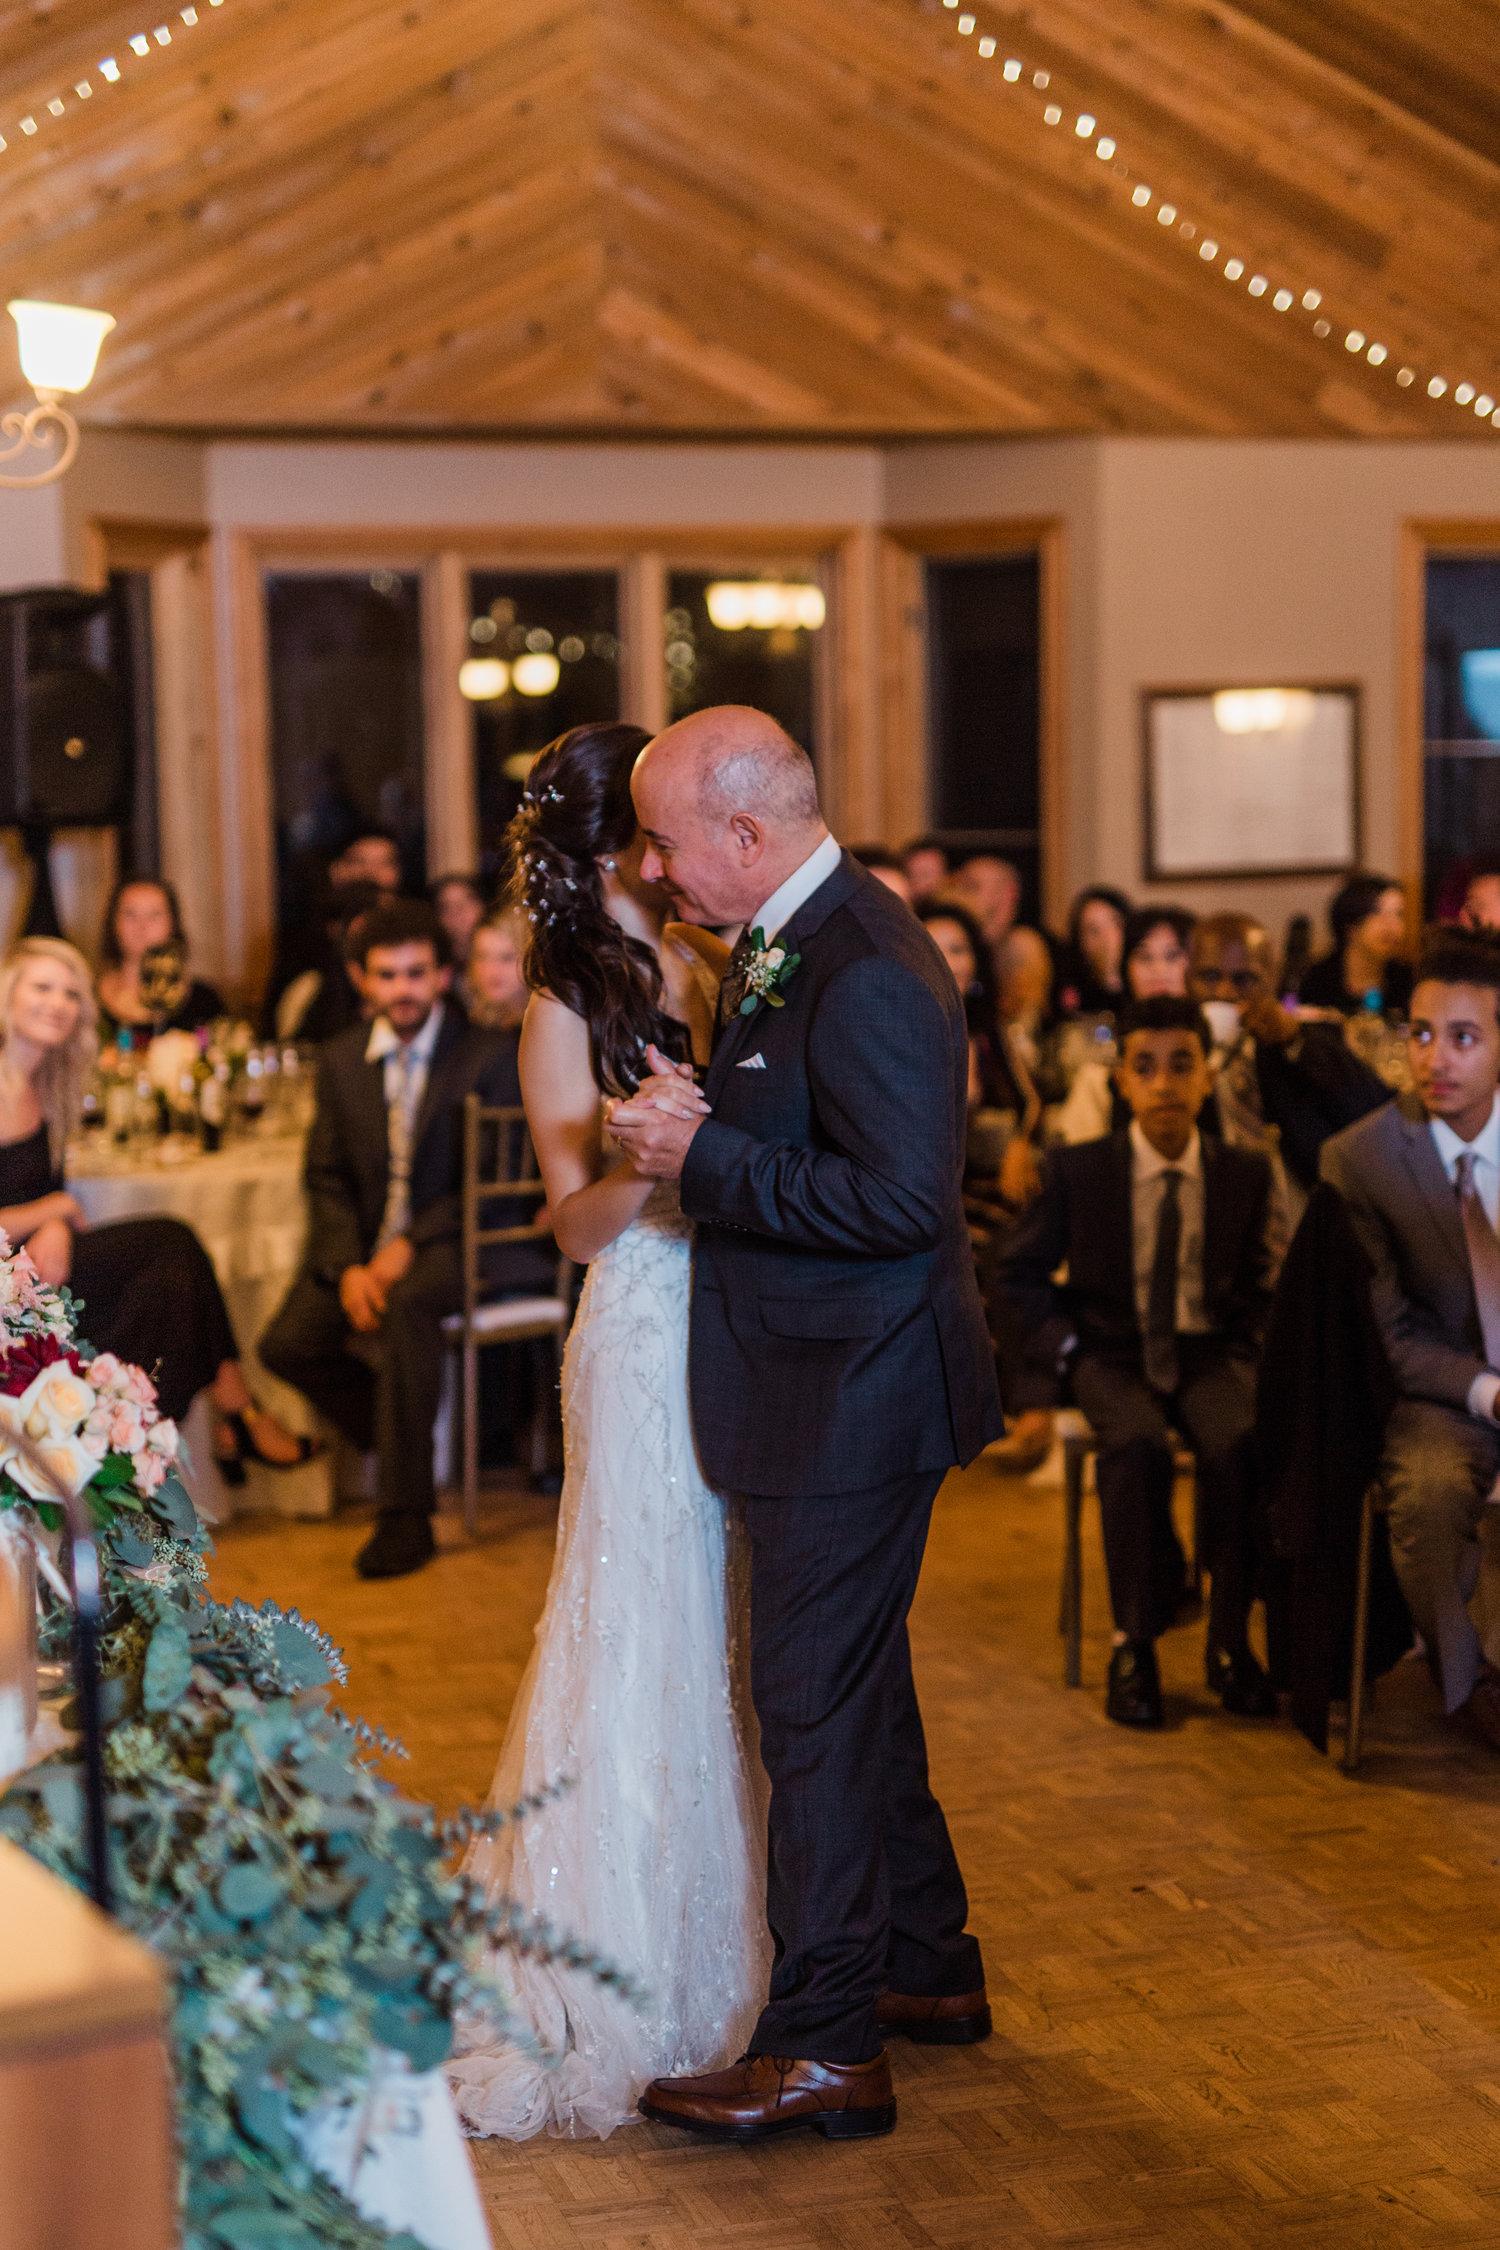 Amir-Golbazi-Danielle-Giroux-Photography_Toronto-Wedding_Cedarwood_Rachel-Paul_727.jpg